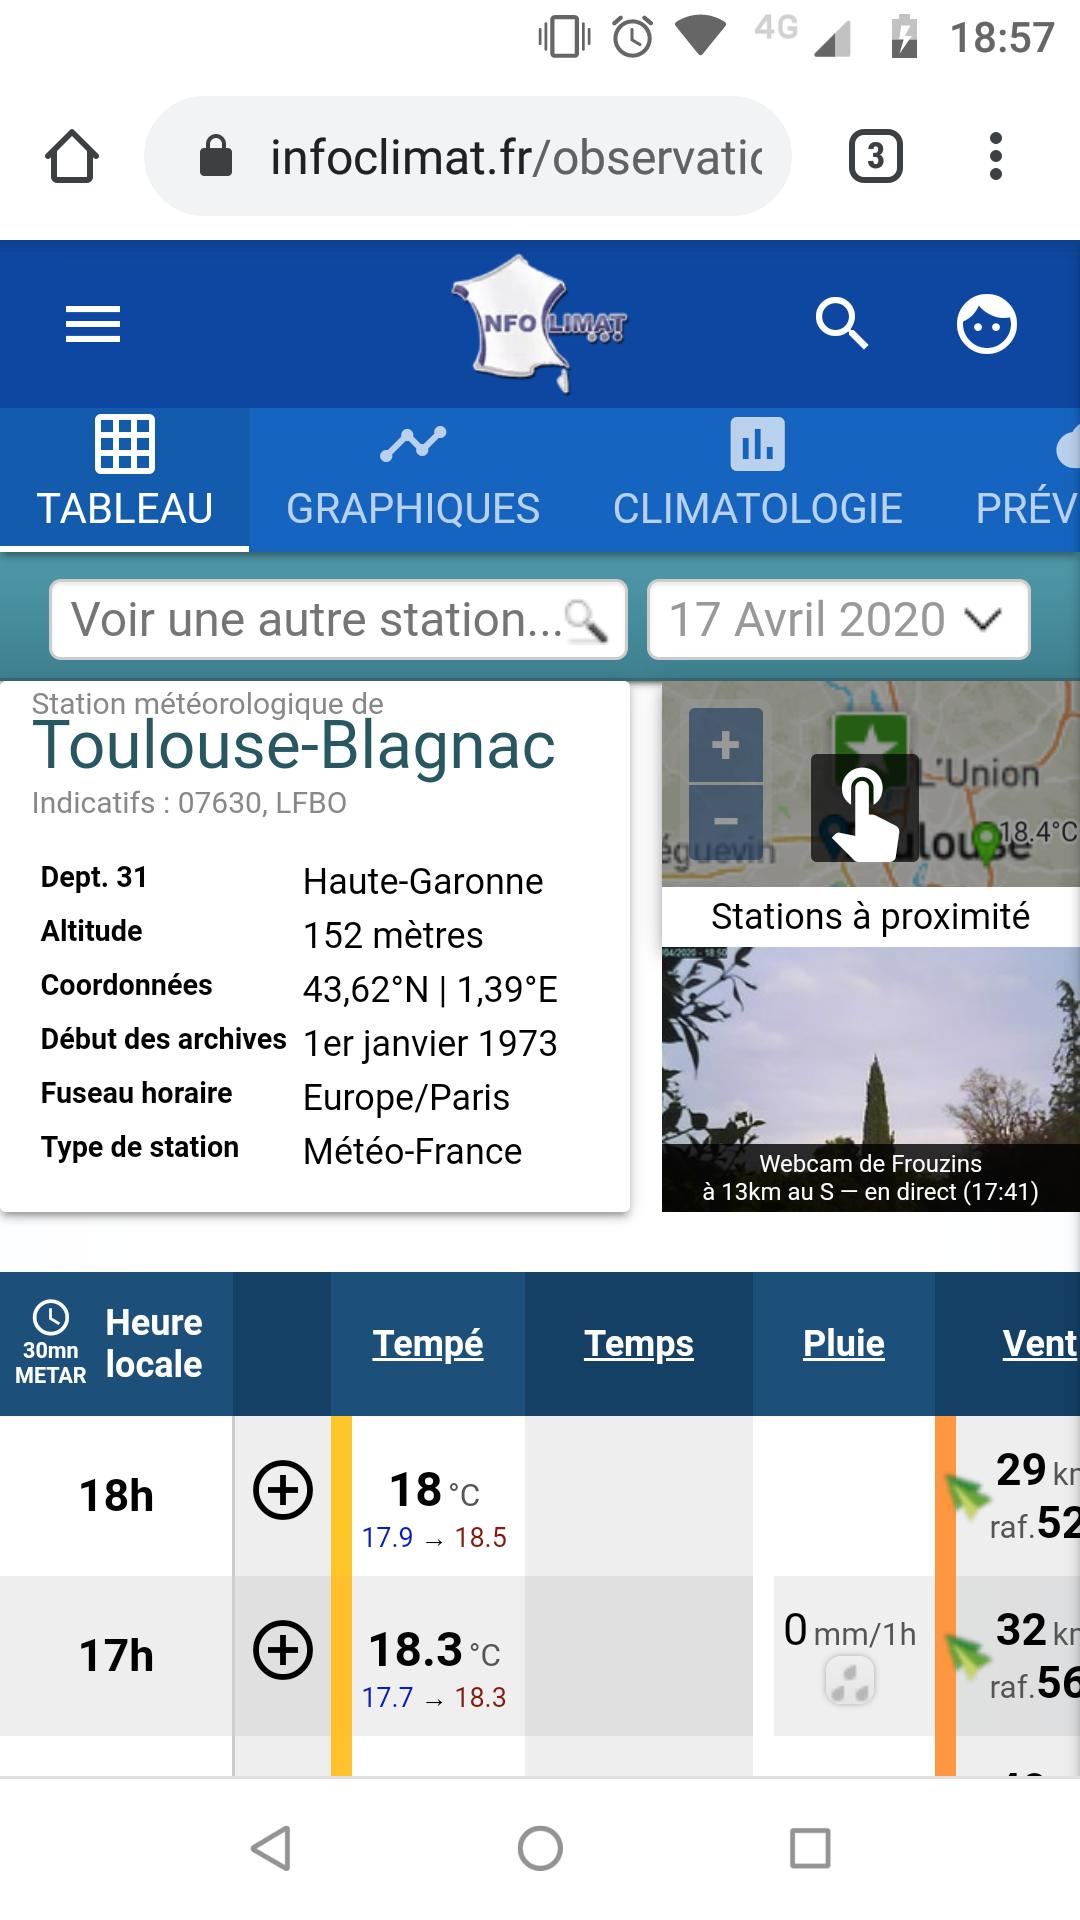 Screenshot_20200417-185724.png